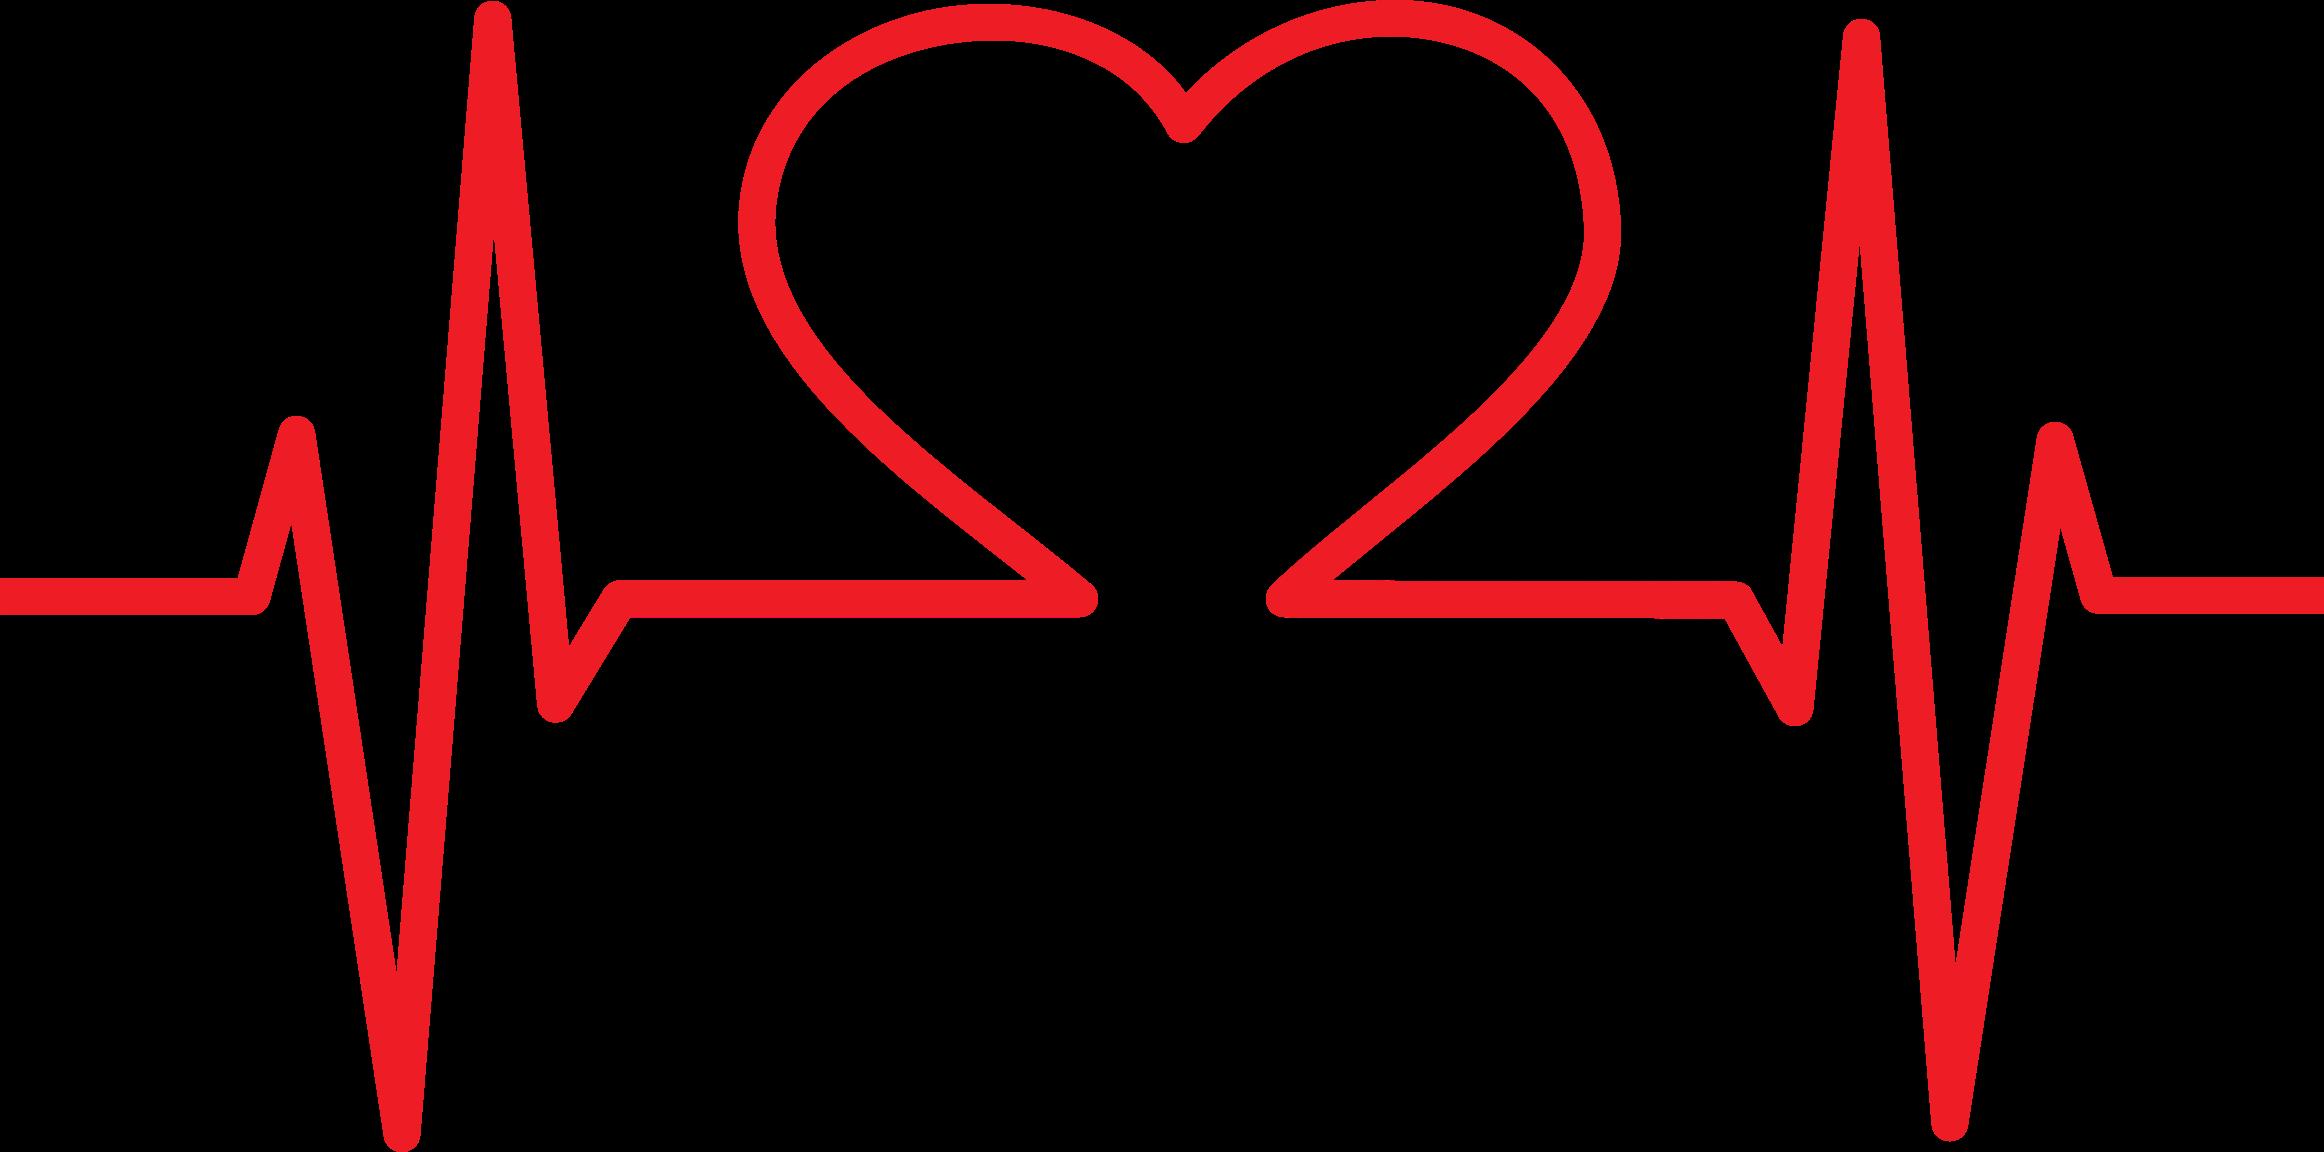 Abnormal cardiac rhythm clipart clipart images gallery for.